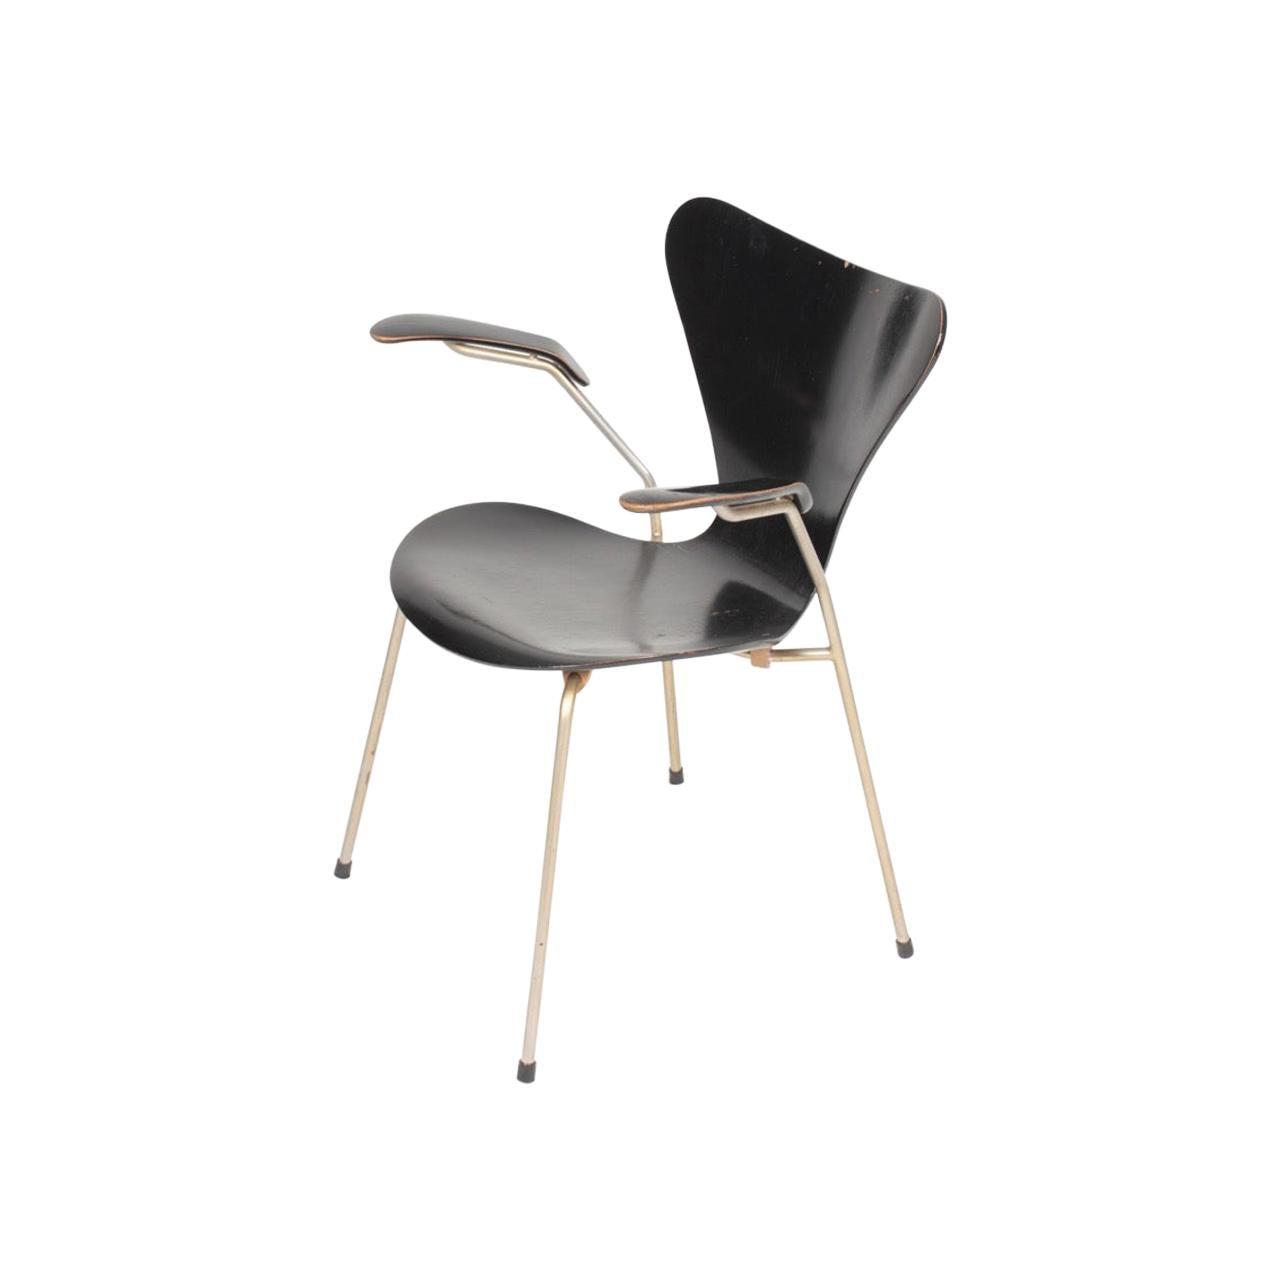 Midcentury Armchair by Arne Jacobsen, 1950s